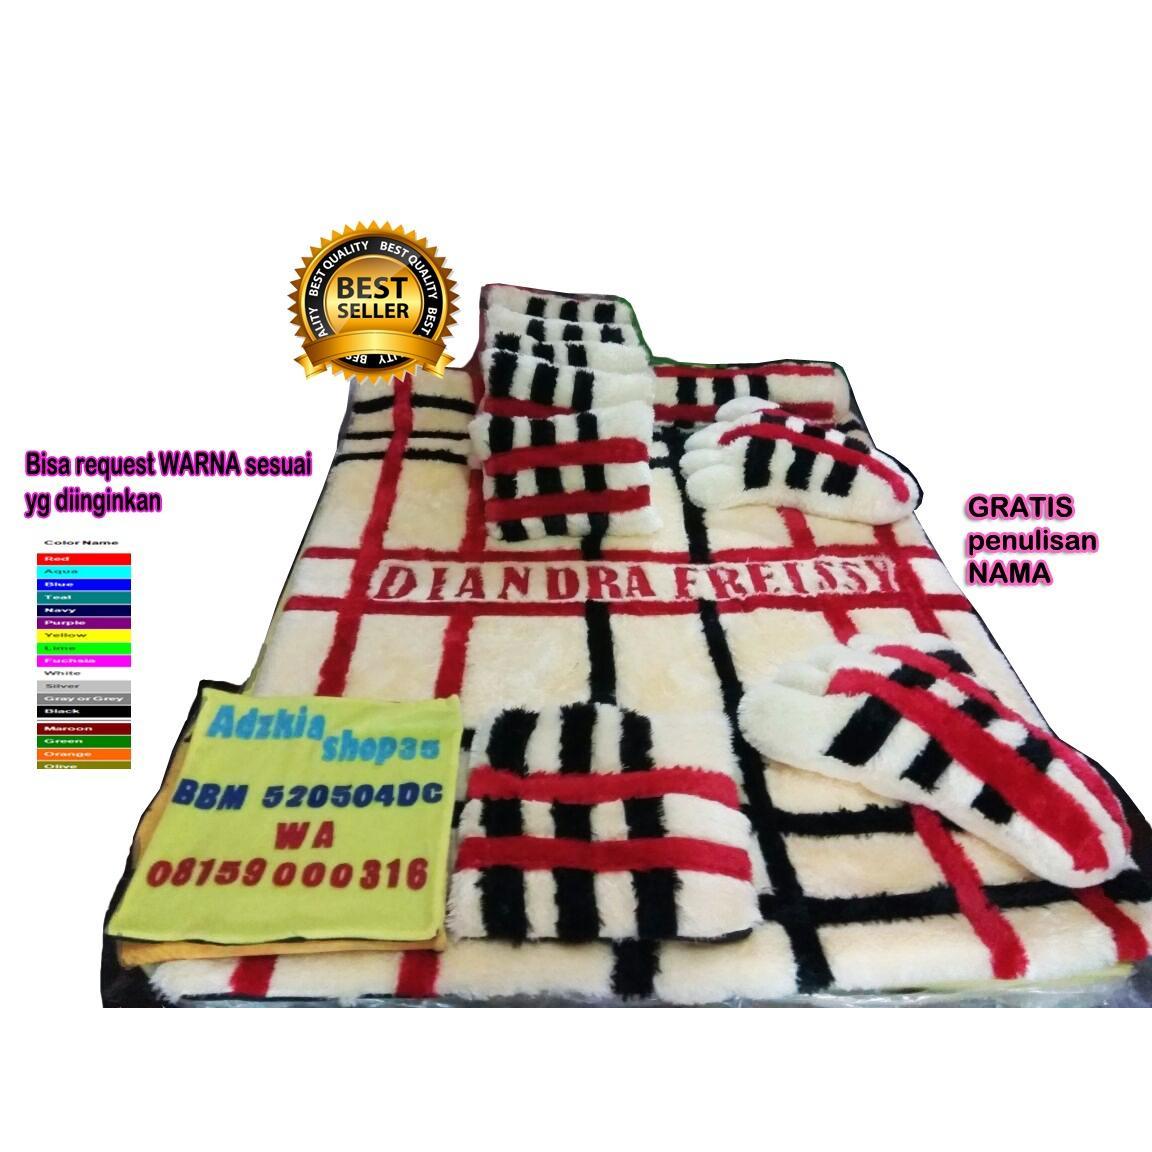 Beli Adzkia35 Kasur Karpet Karakter Garis Kotak Fullset Adzkia Online